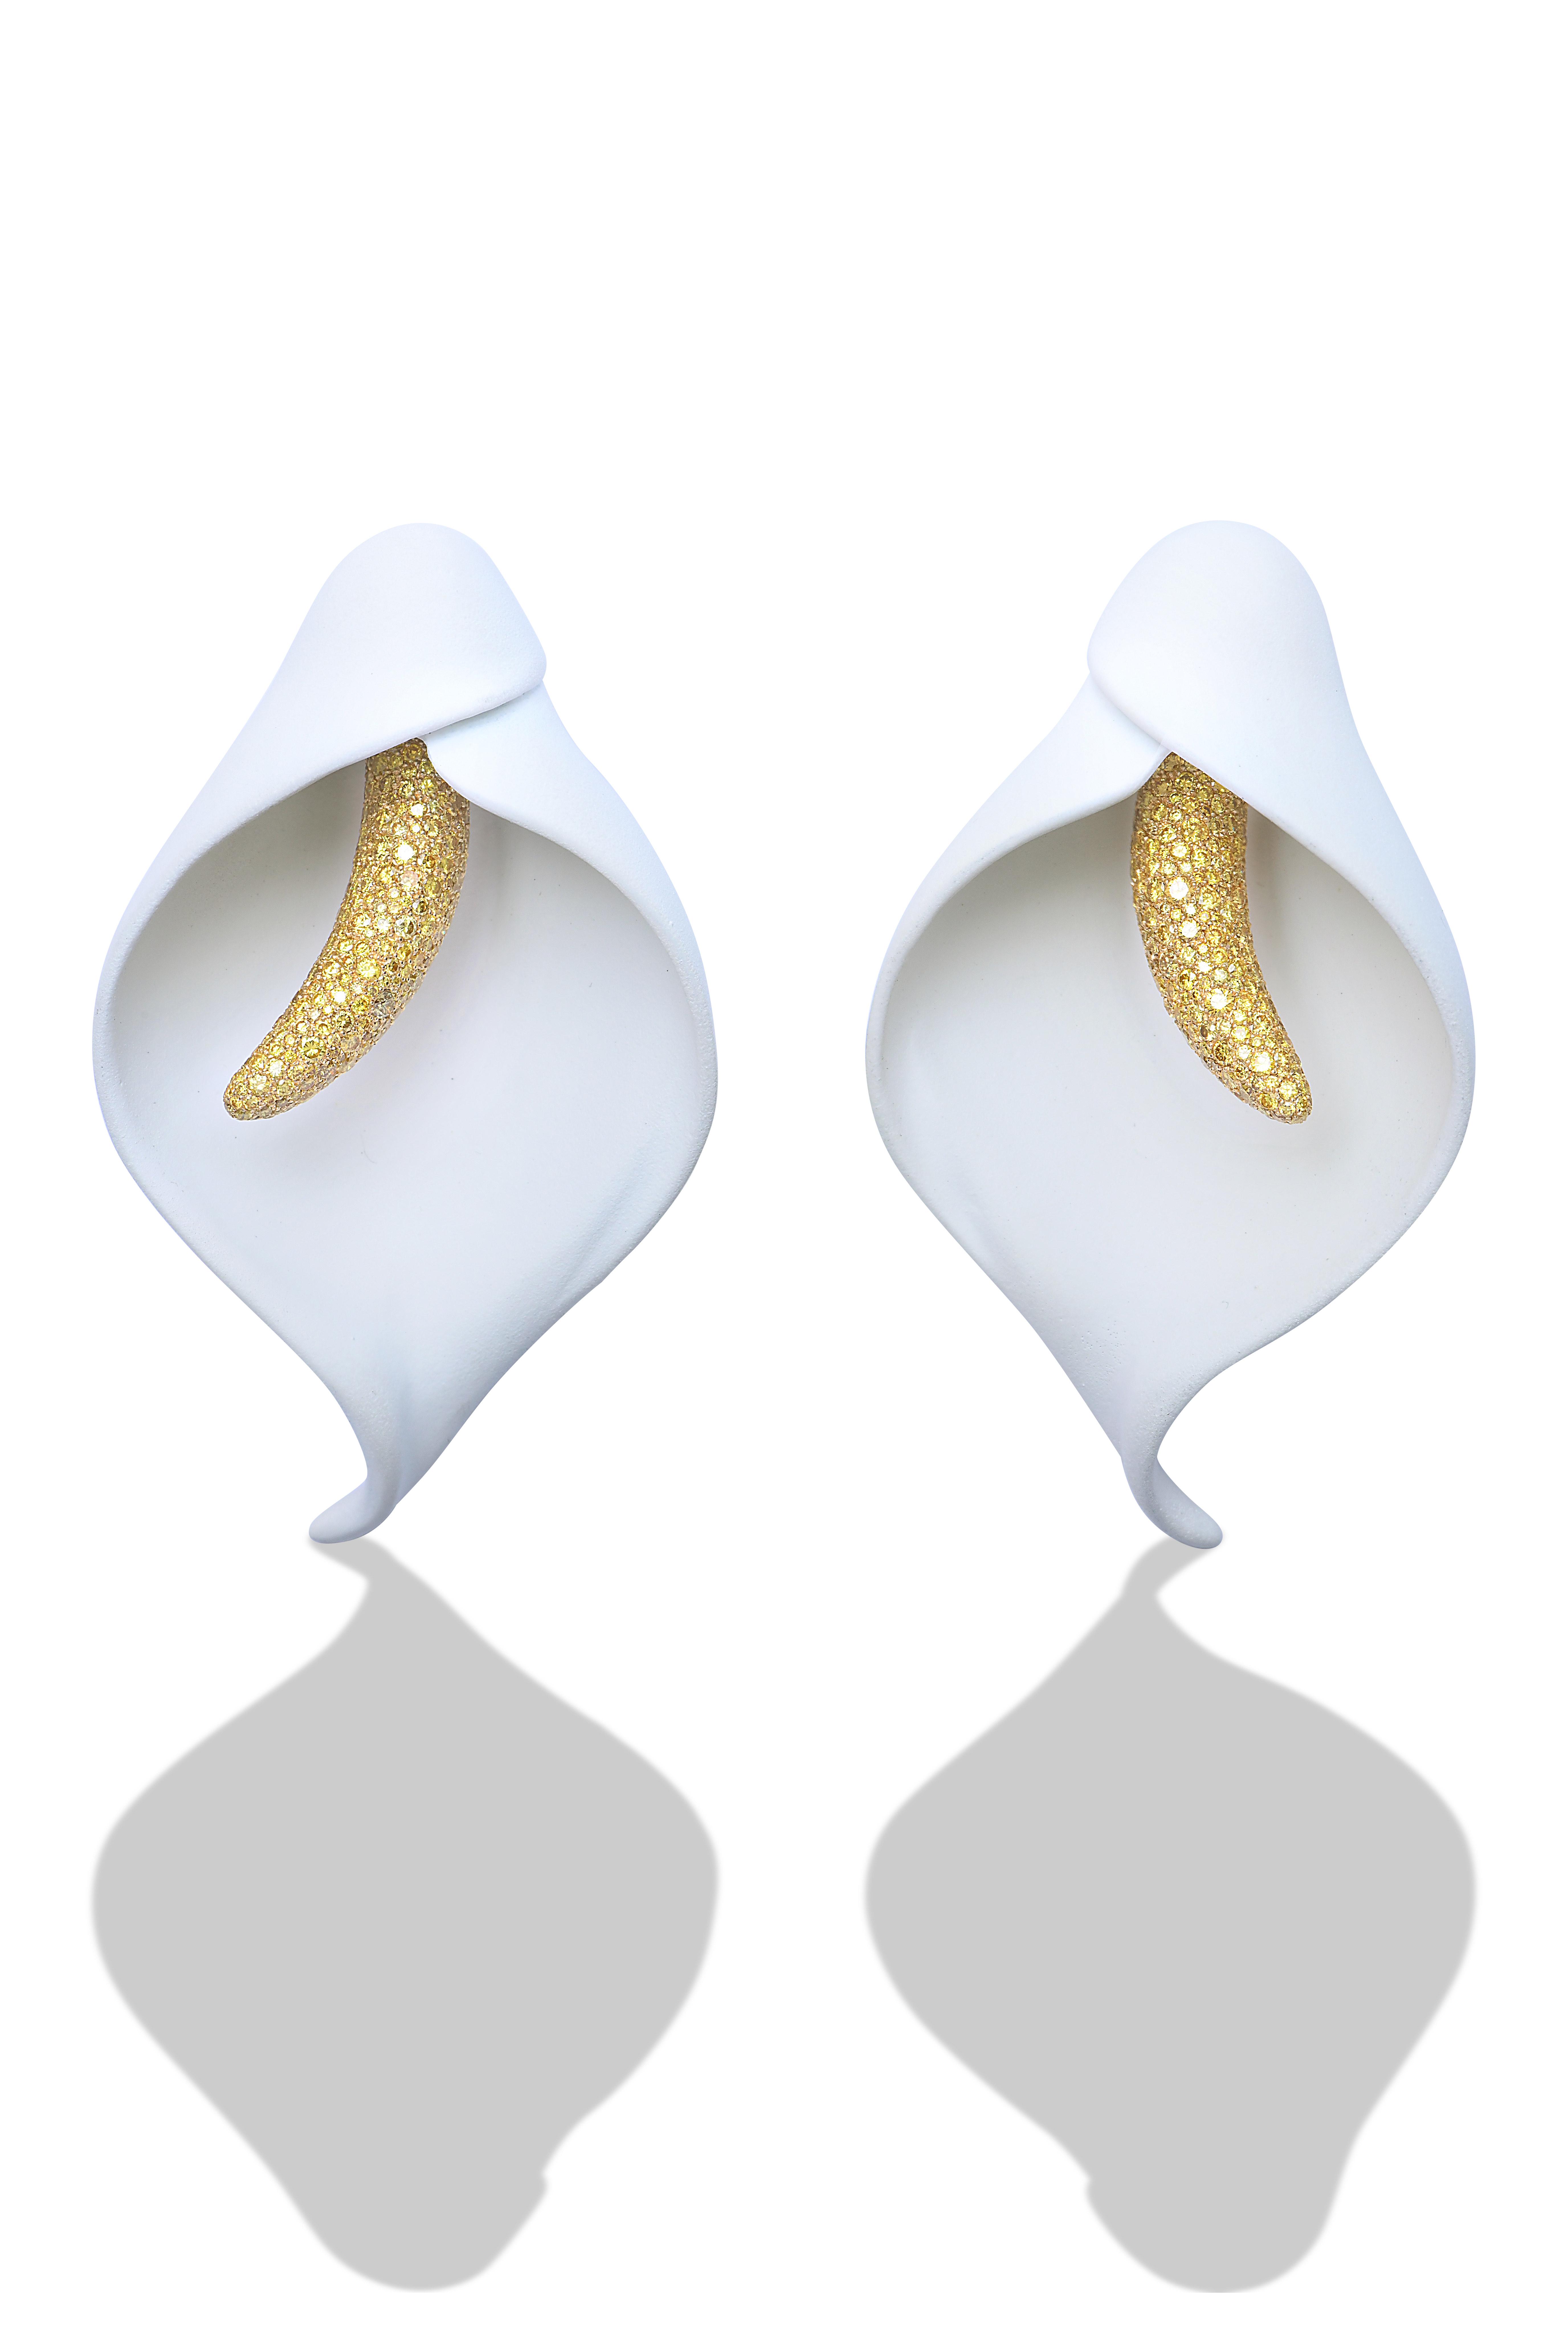 Arum Lily Earrings: Aluminium and Yellow Diamonds. Image Courtesy of Emmanuel Tarpin